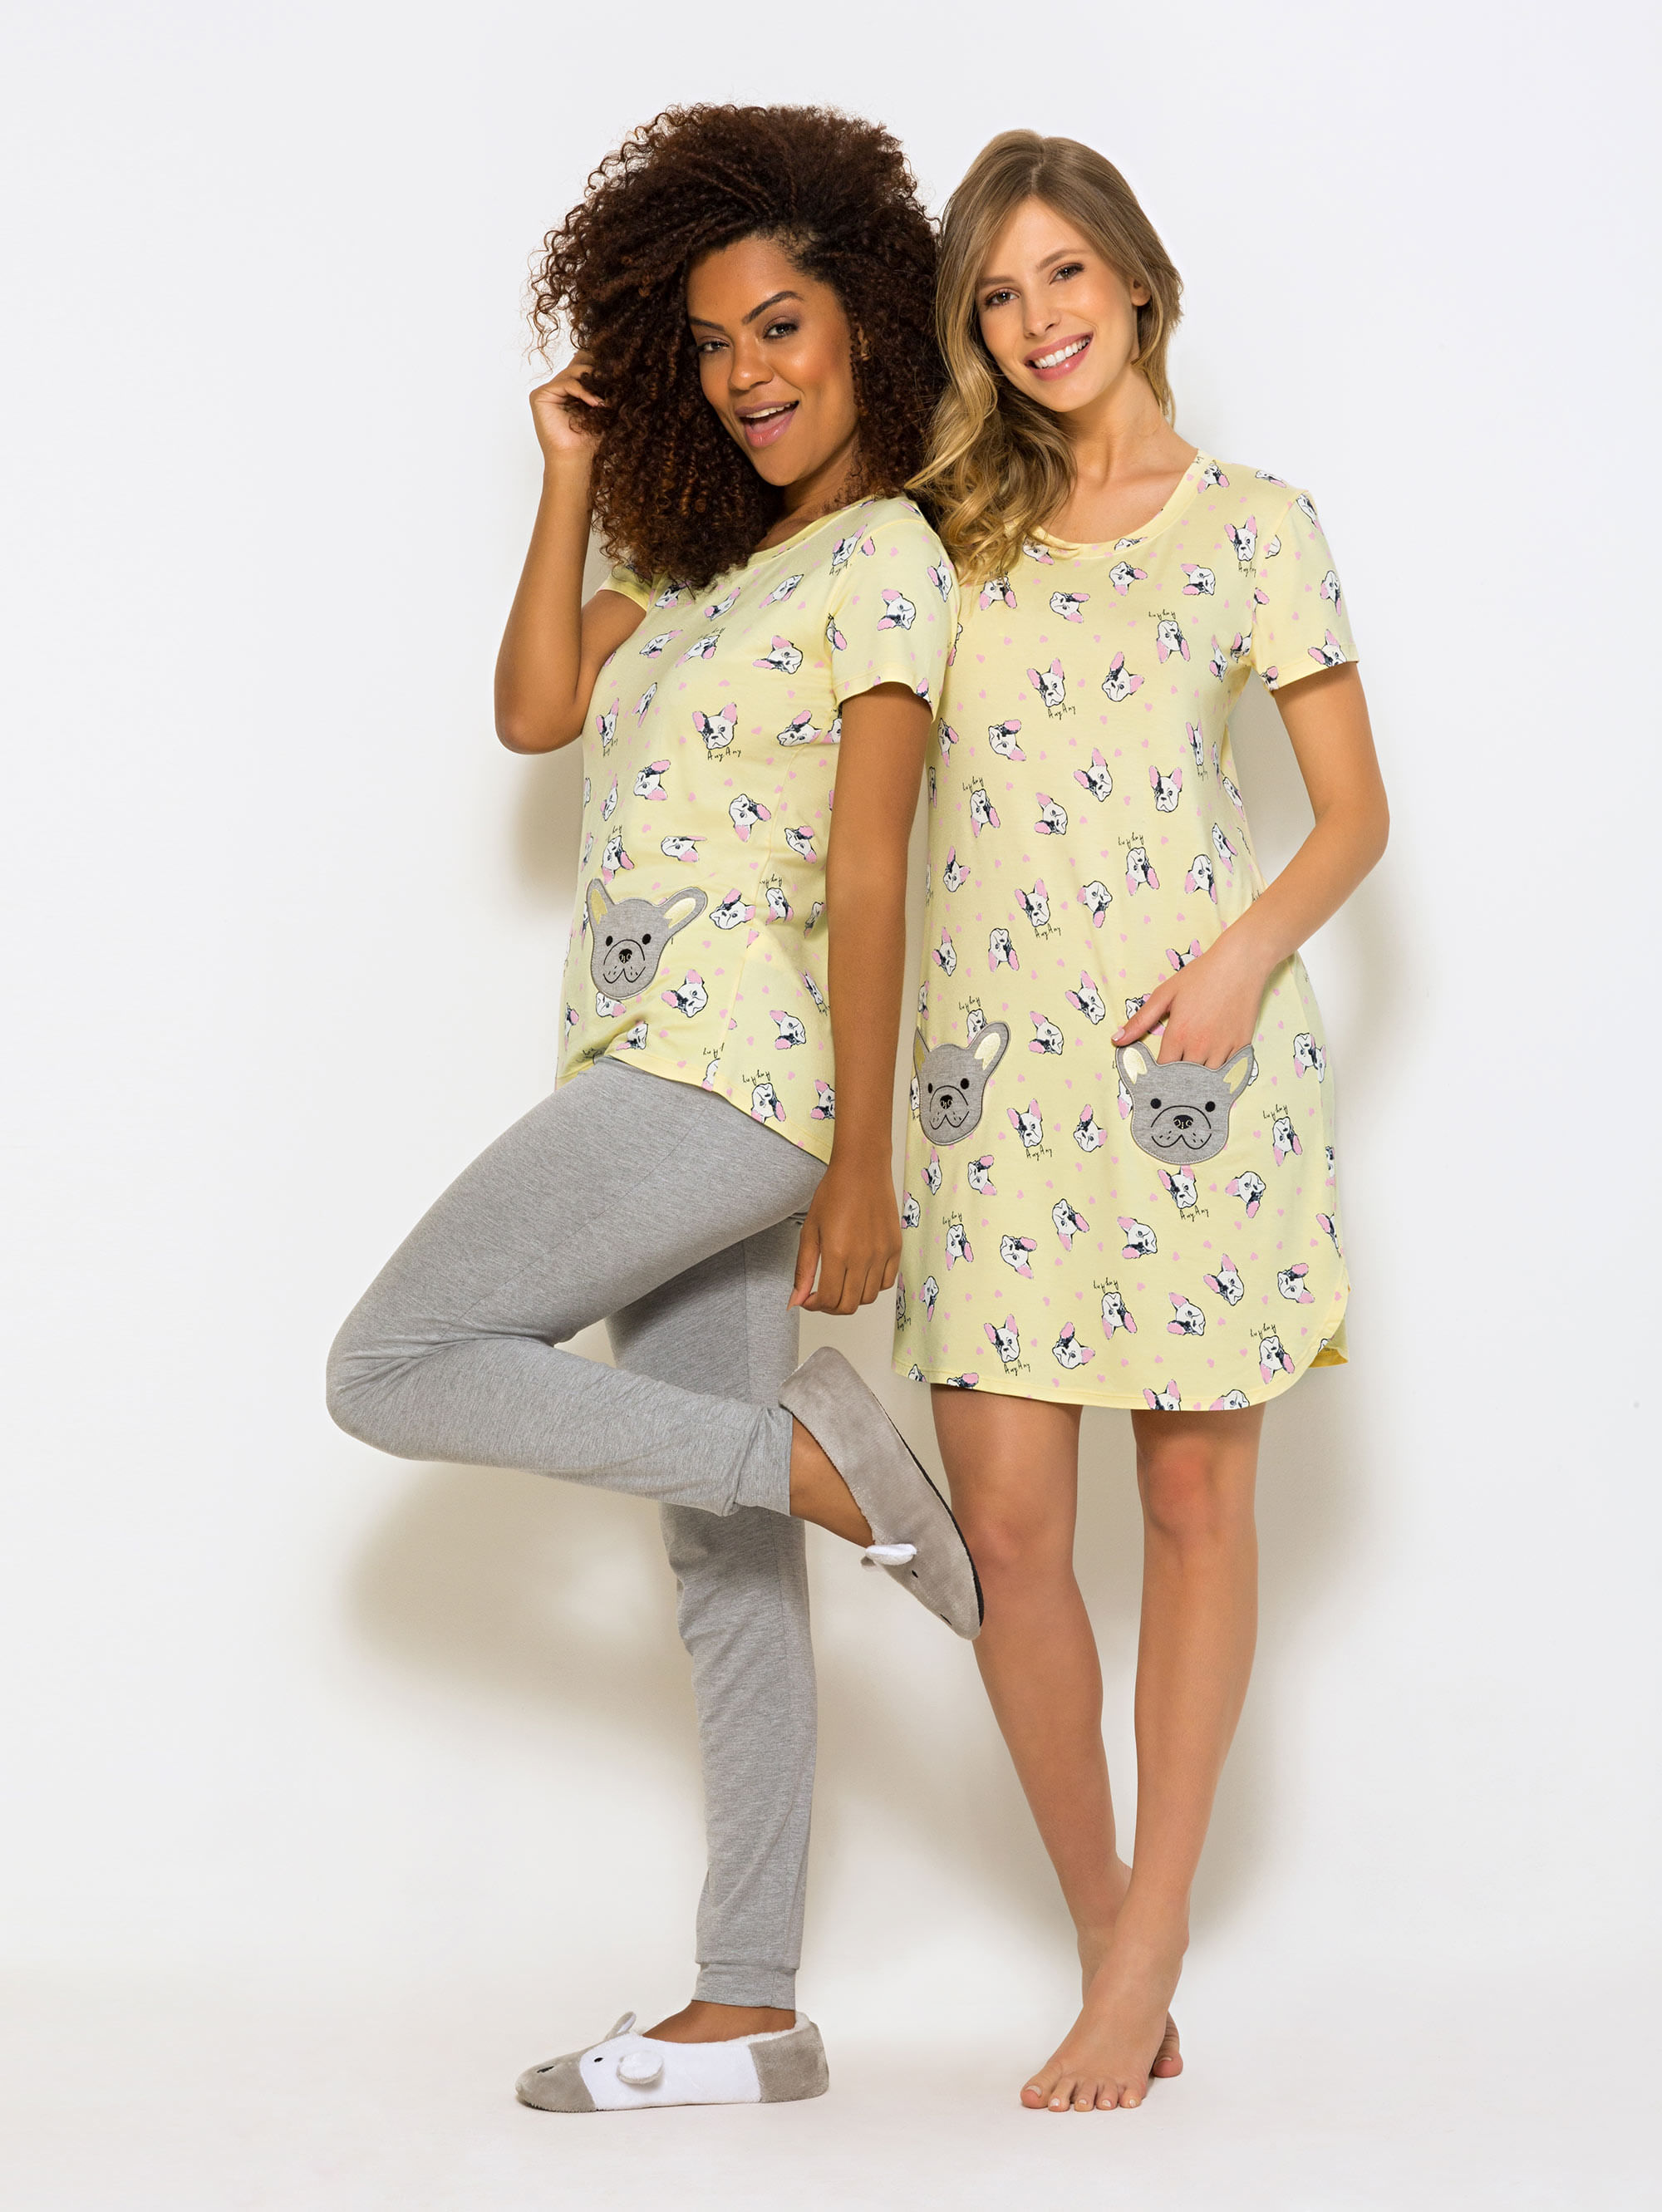 Pijama-e-Camisola-Manga-Curta-Yellow-Dog-01.03.1266